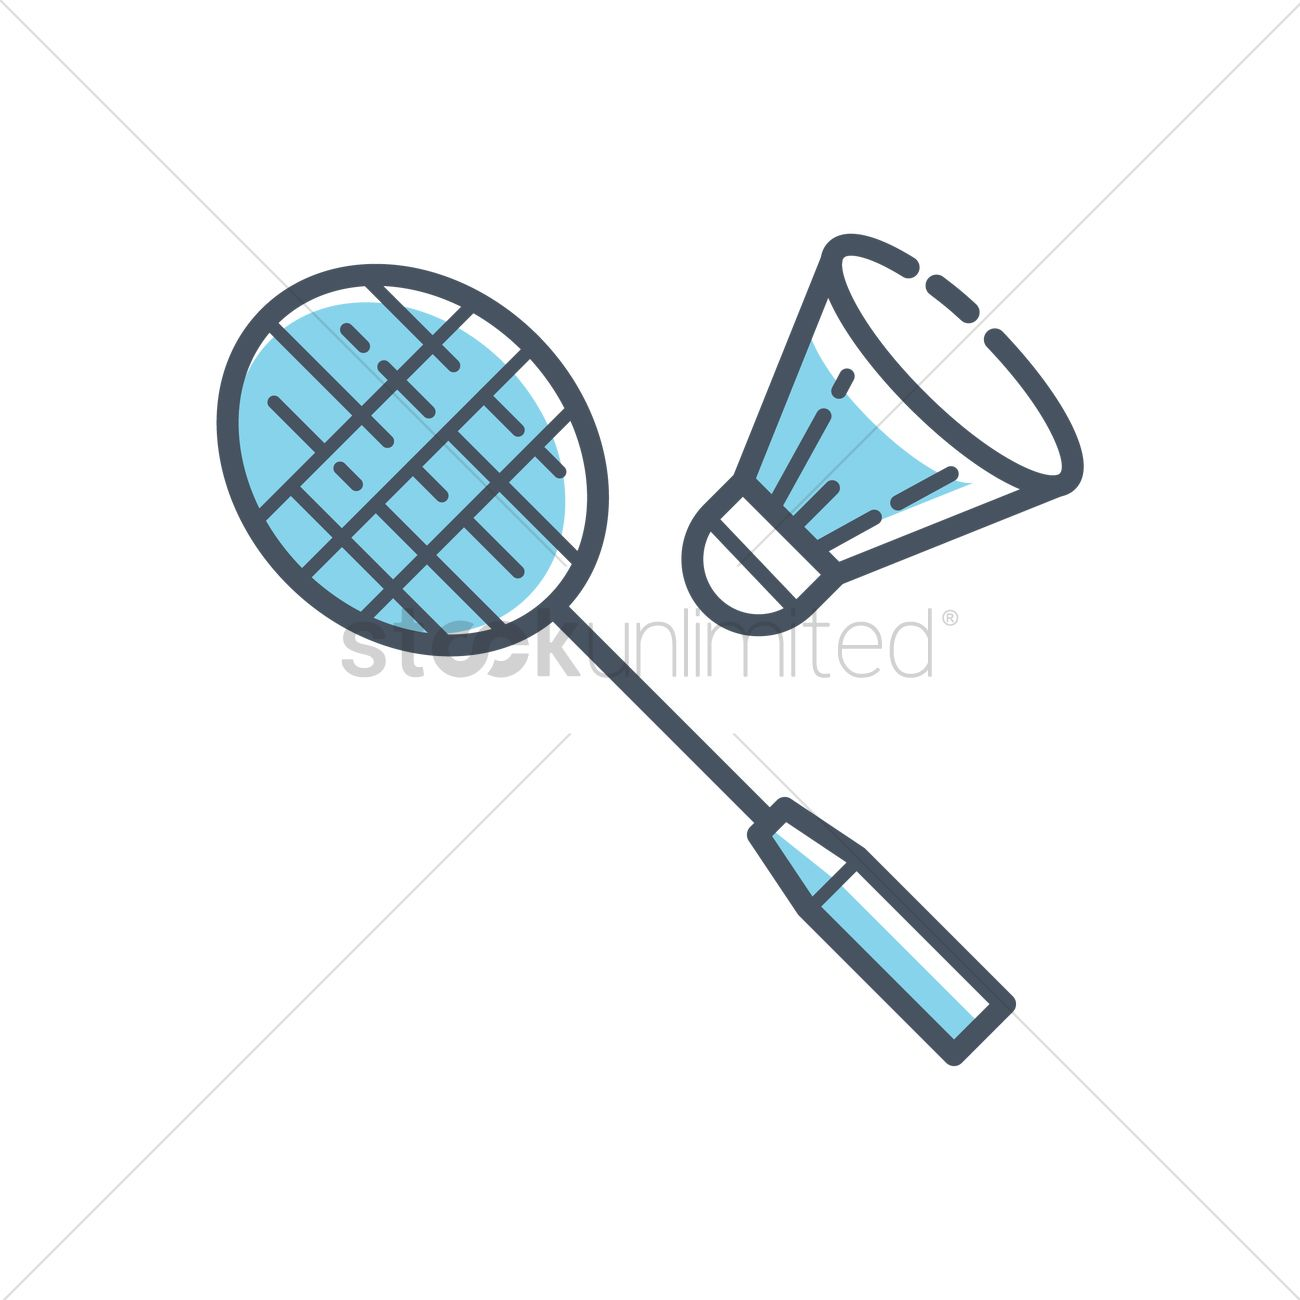 Badminton racquets and shuttlecock